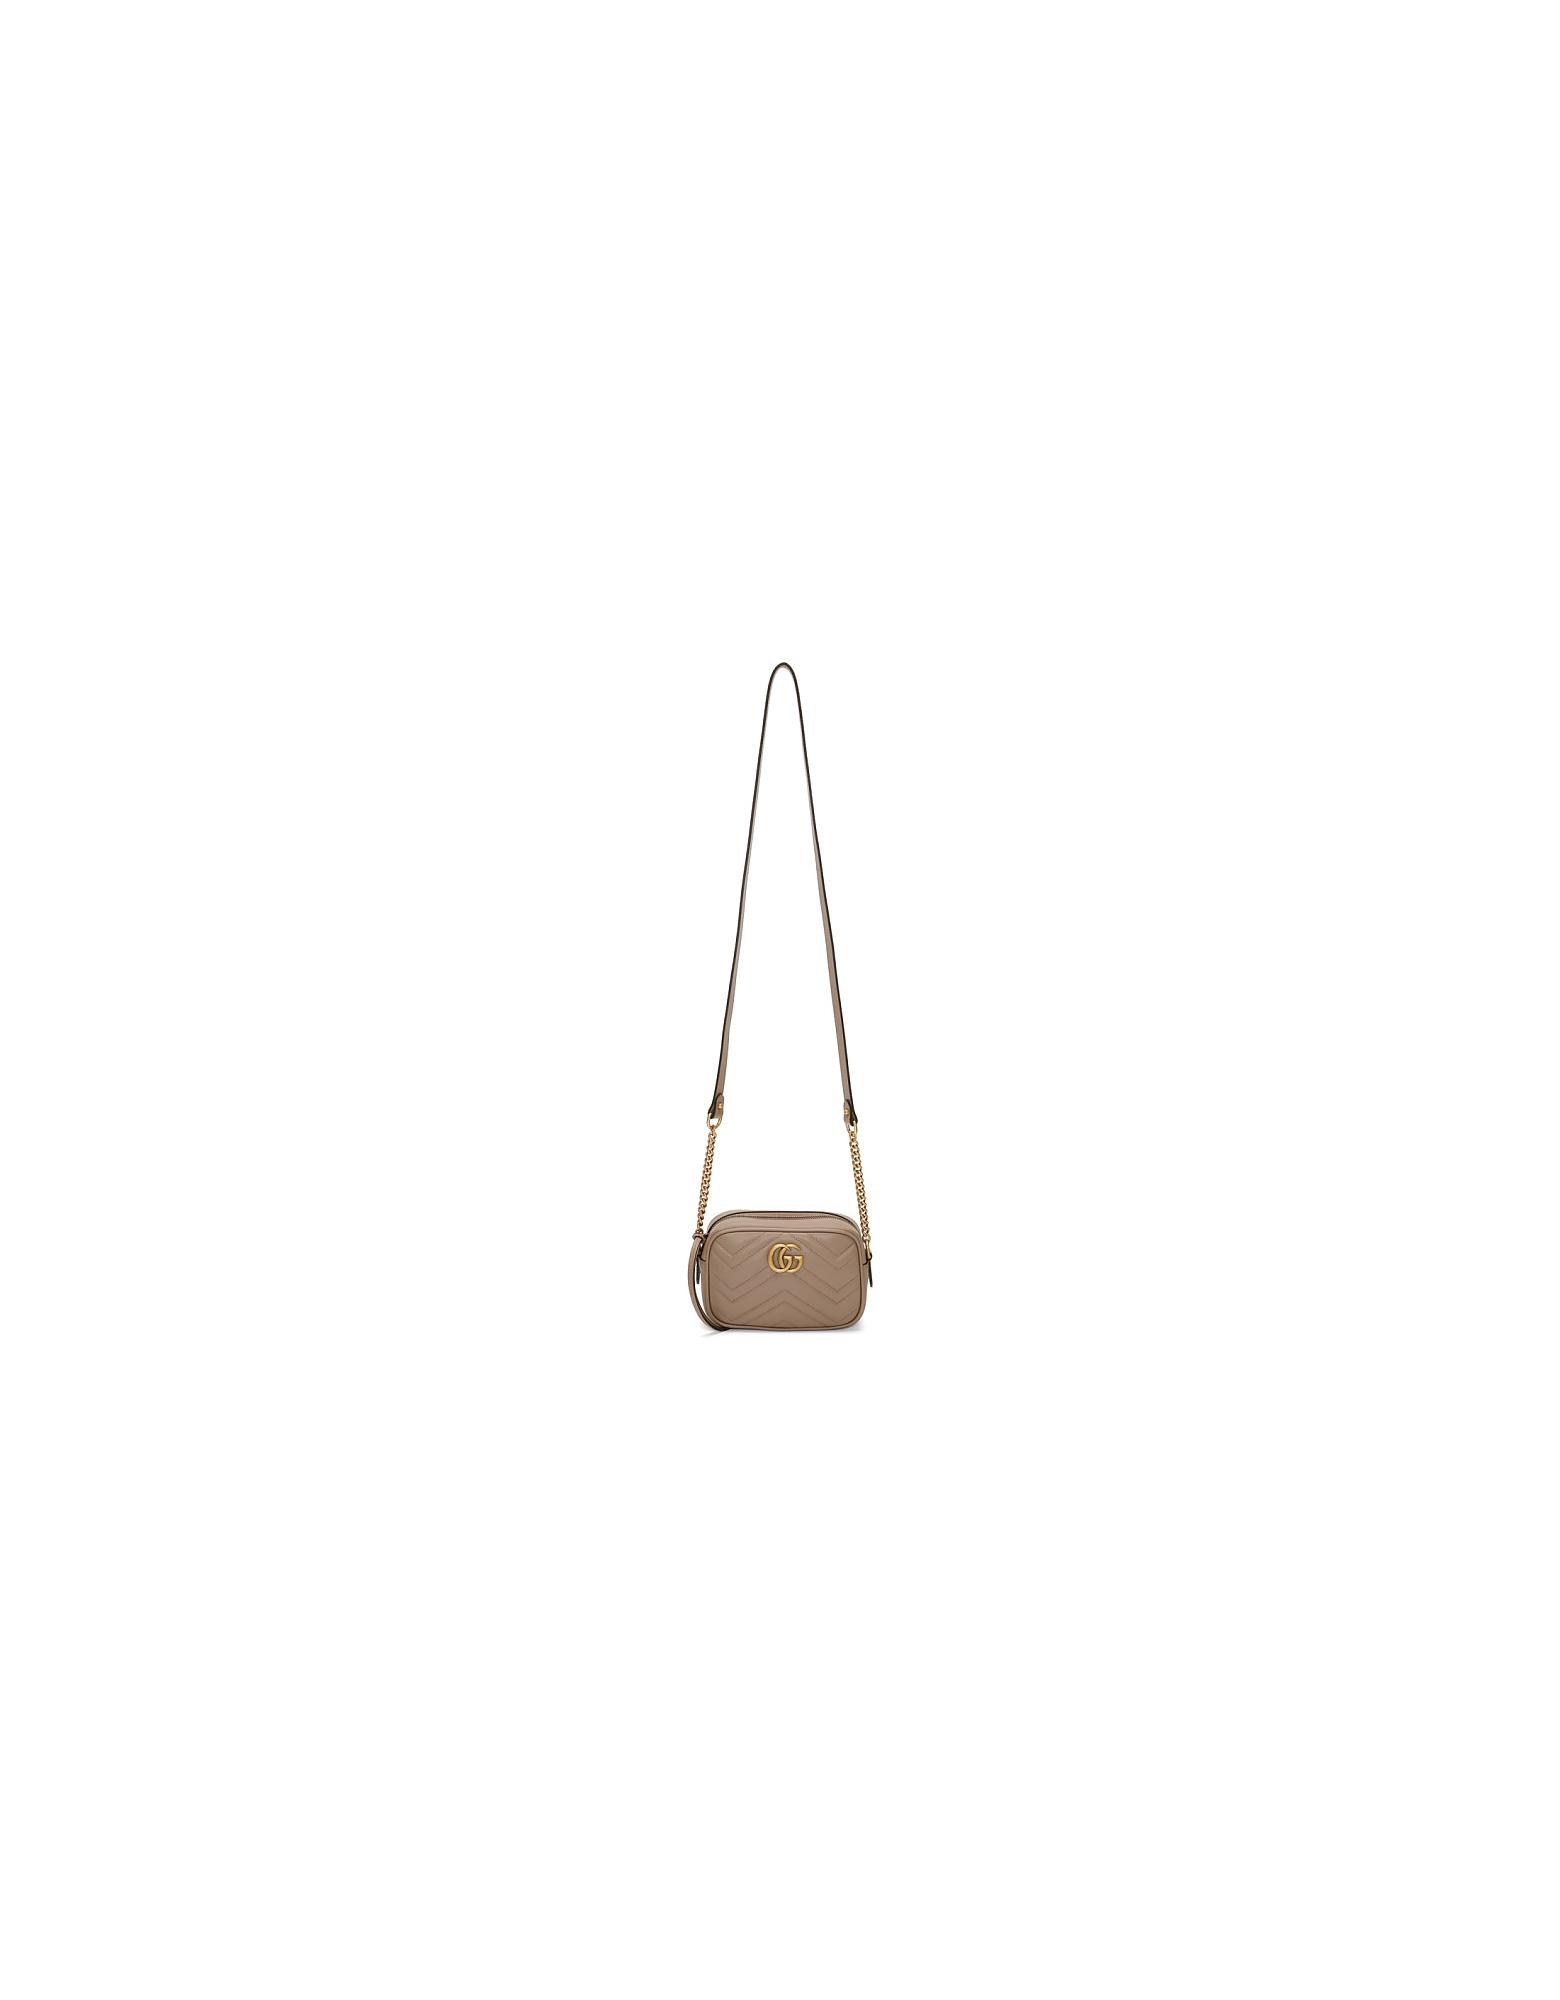 Gucci Designer Handbags, Pink GG Marmont Camera Bag